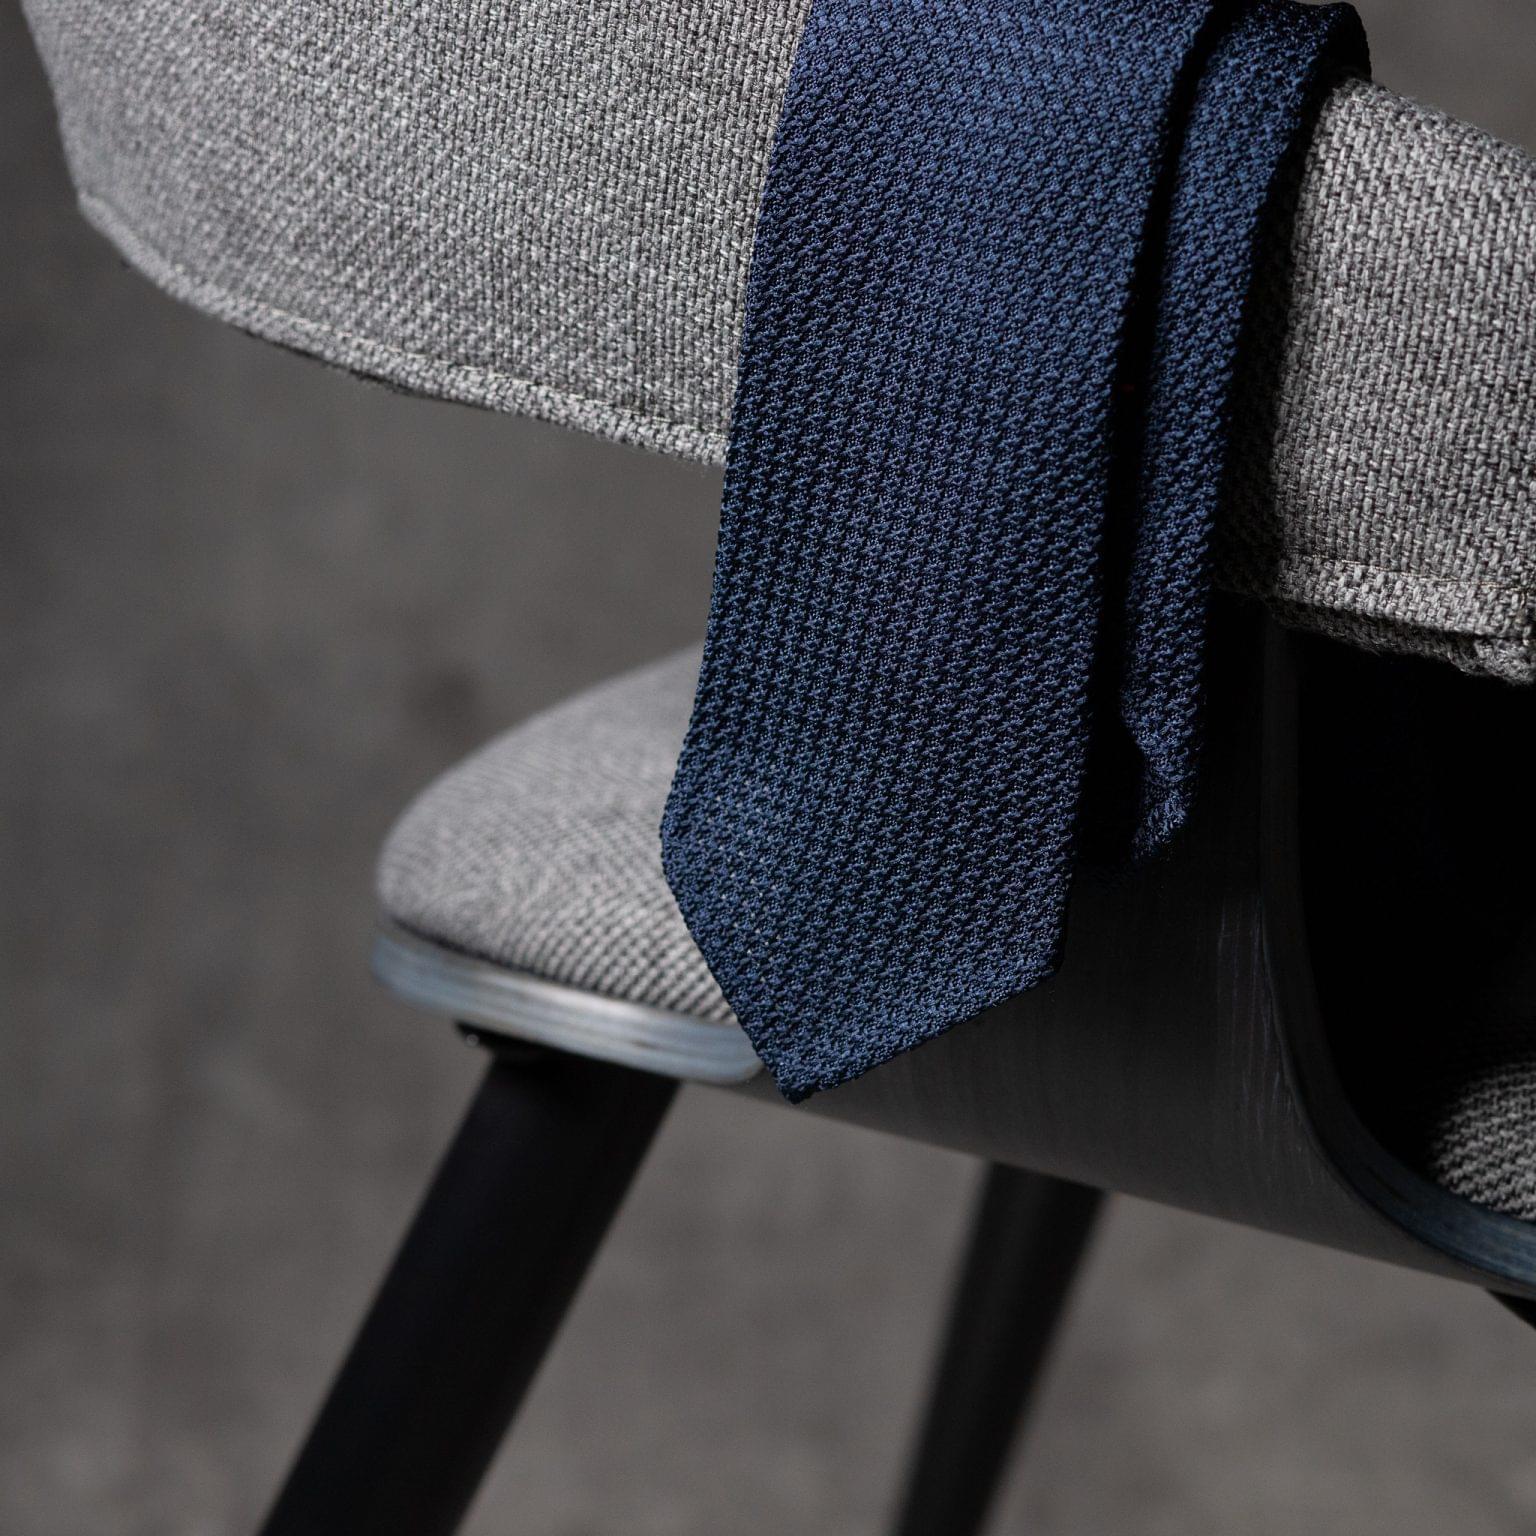 GRENADINE-0146-Tie-Initials-Corbata-Iniciales-The-Seelk-2